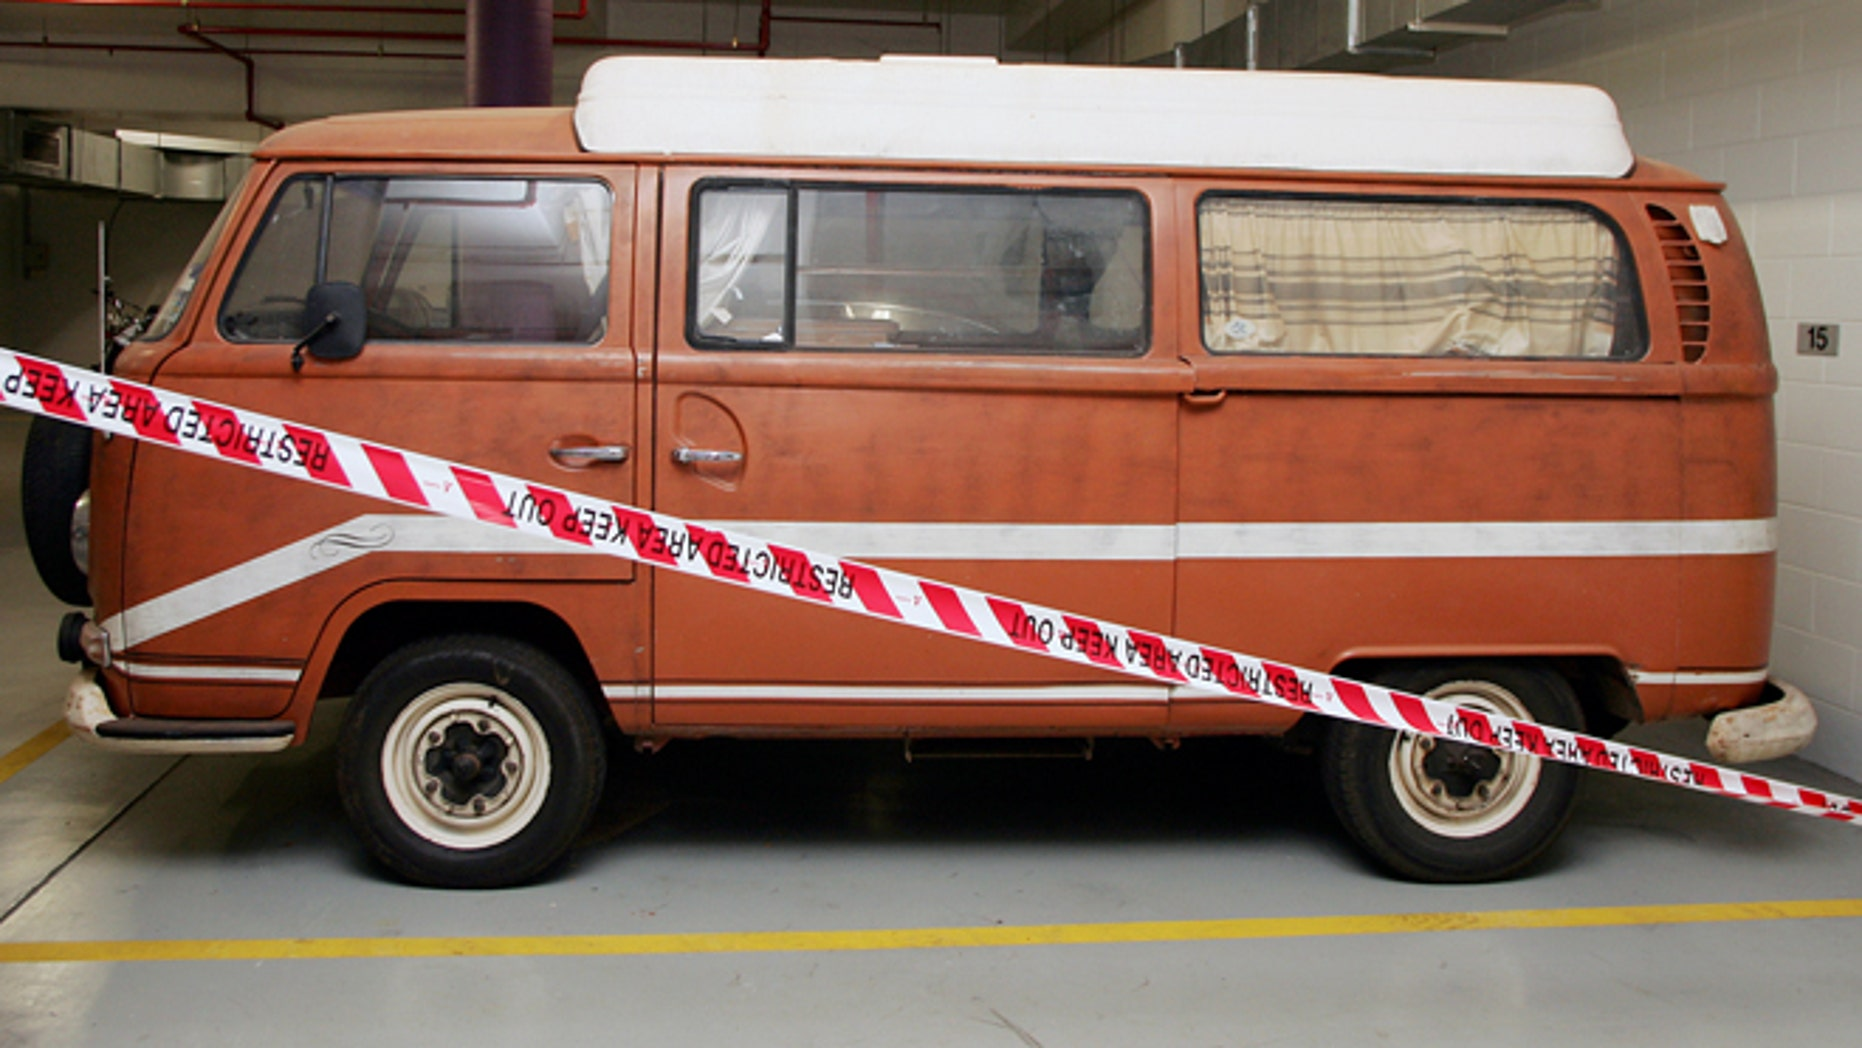 The van belonging to Falconio and Lees.